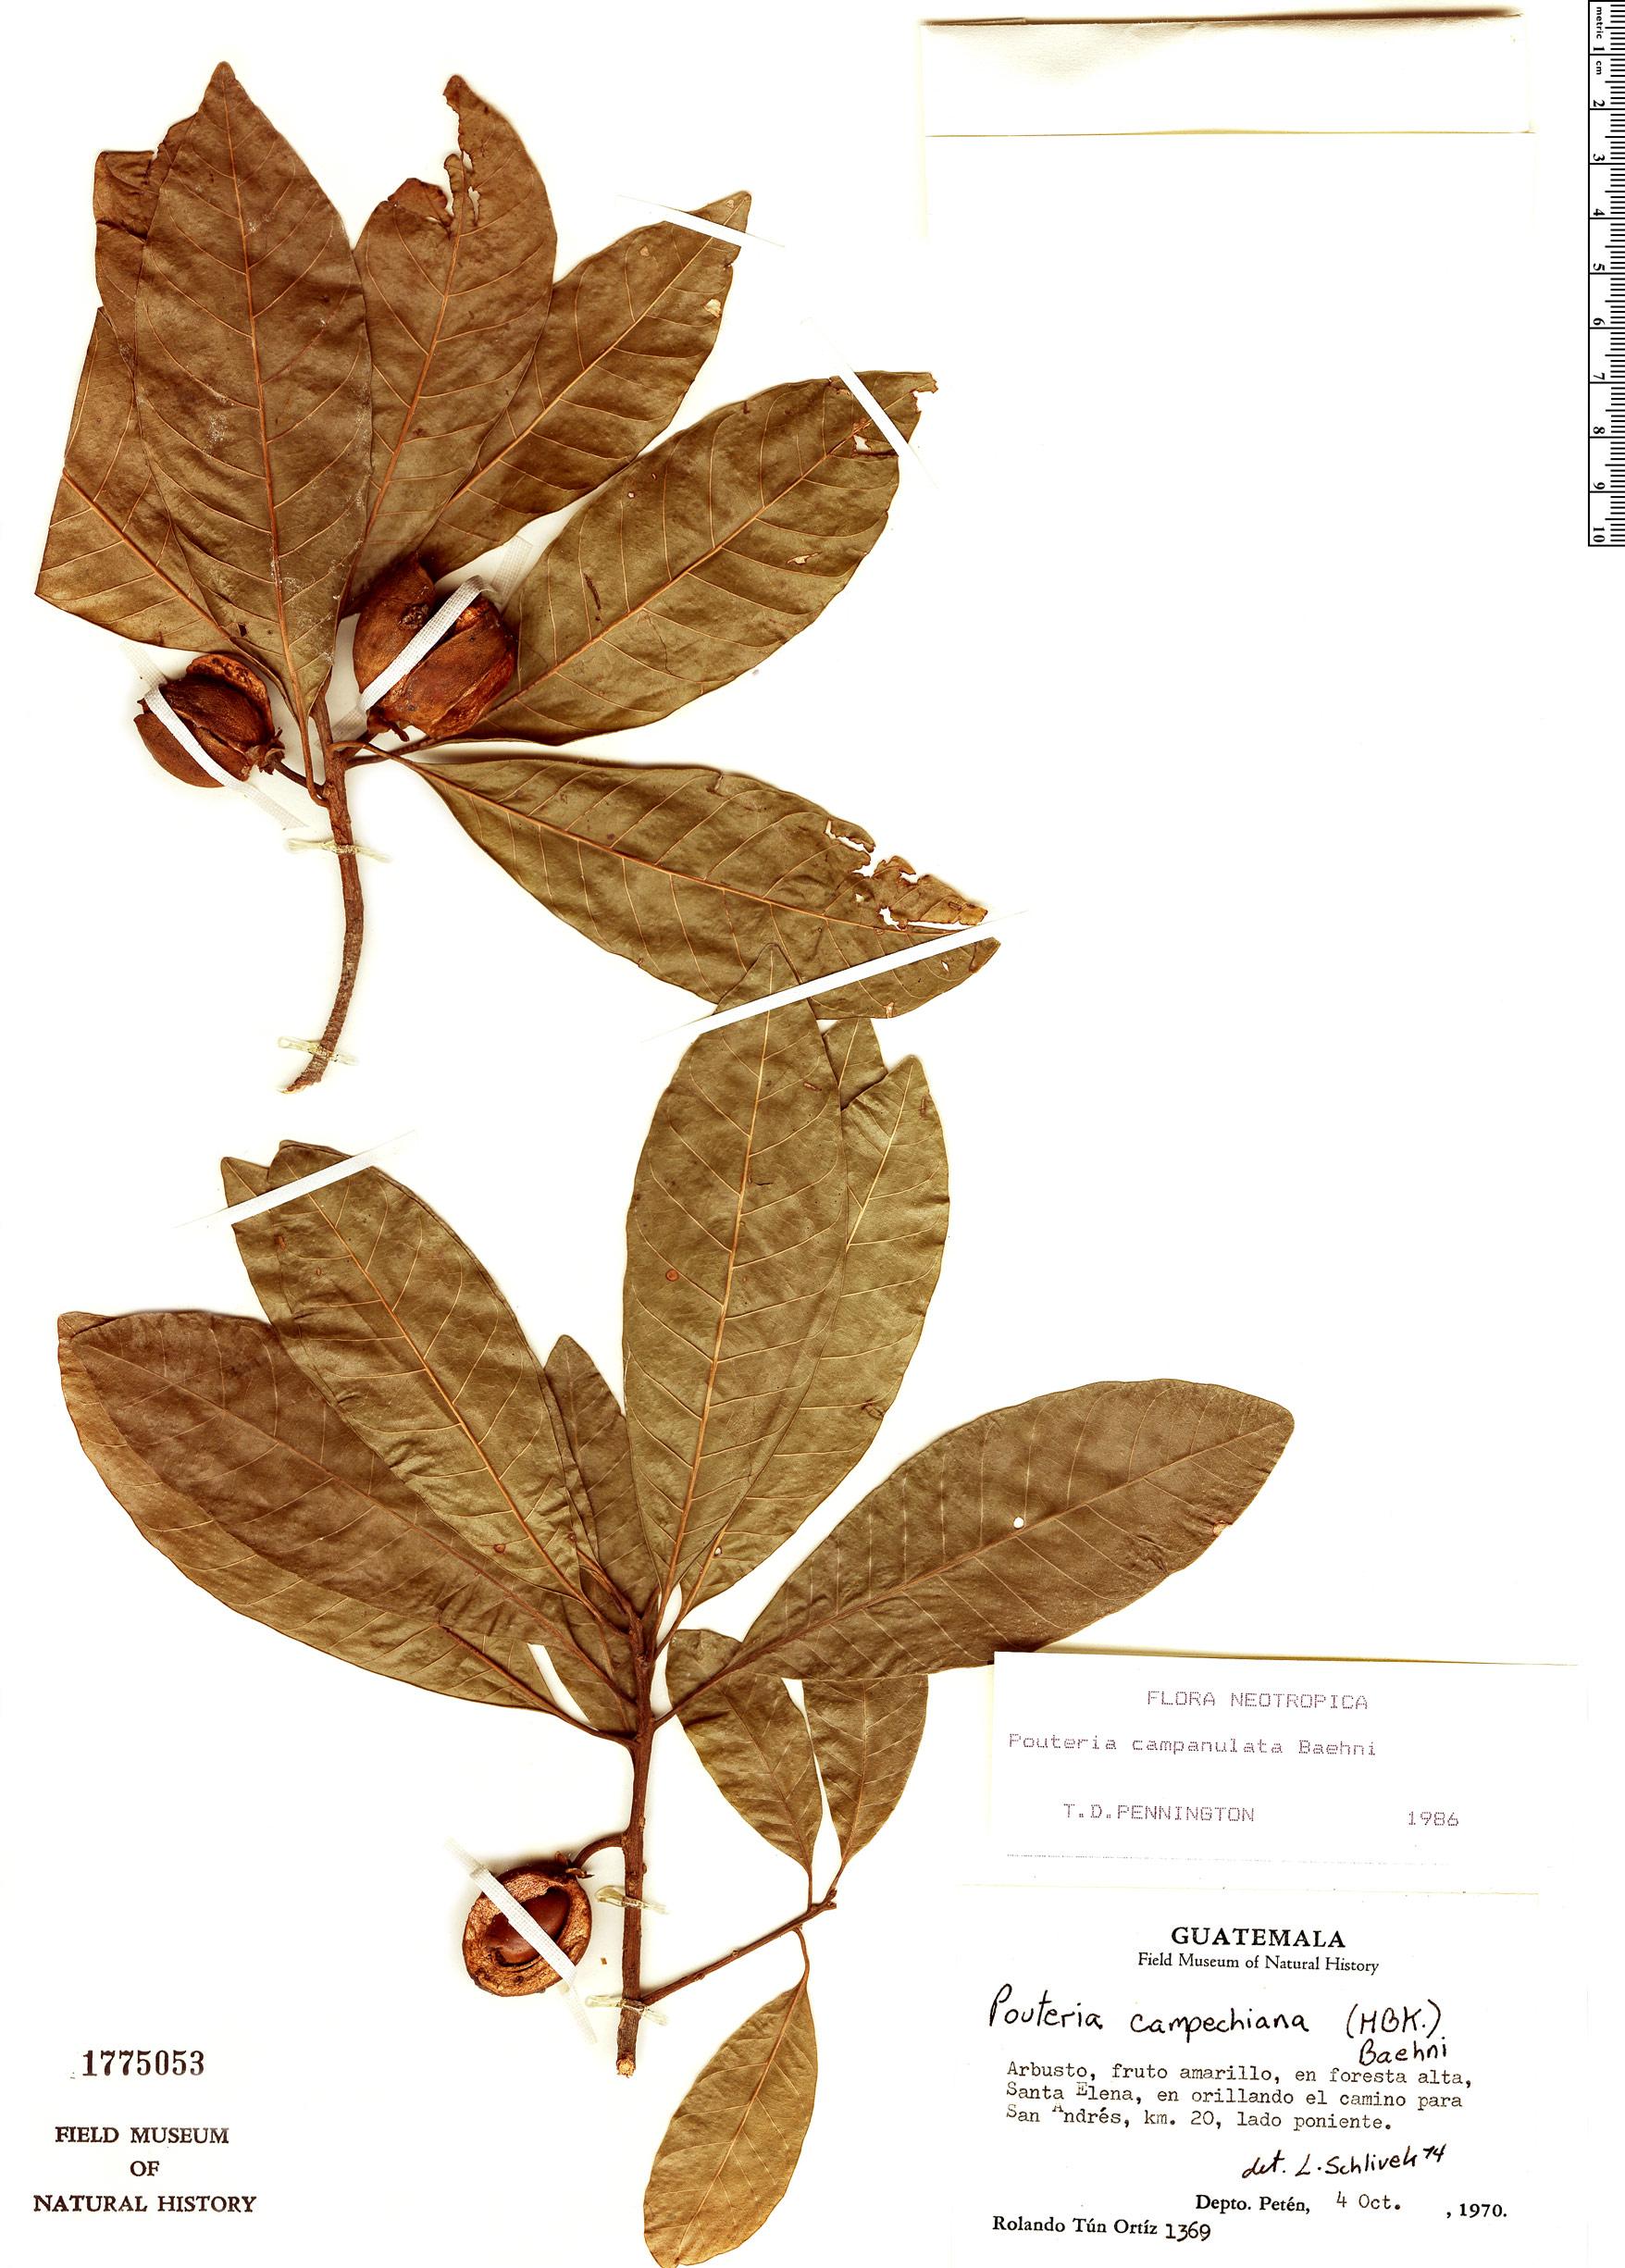 Specimen: Pouteria campanulata